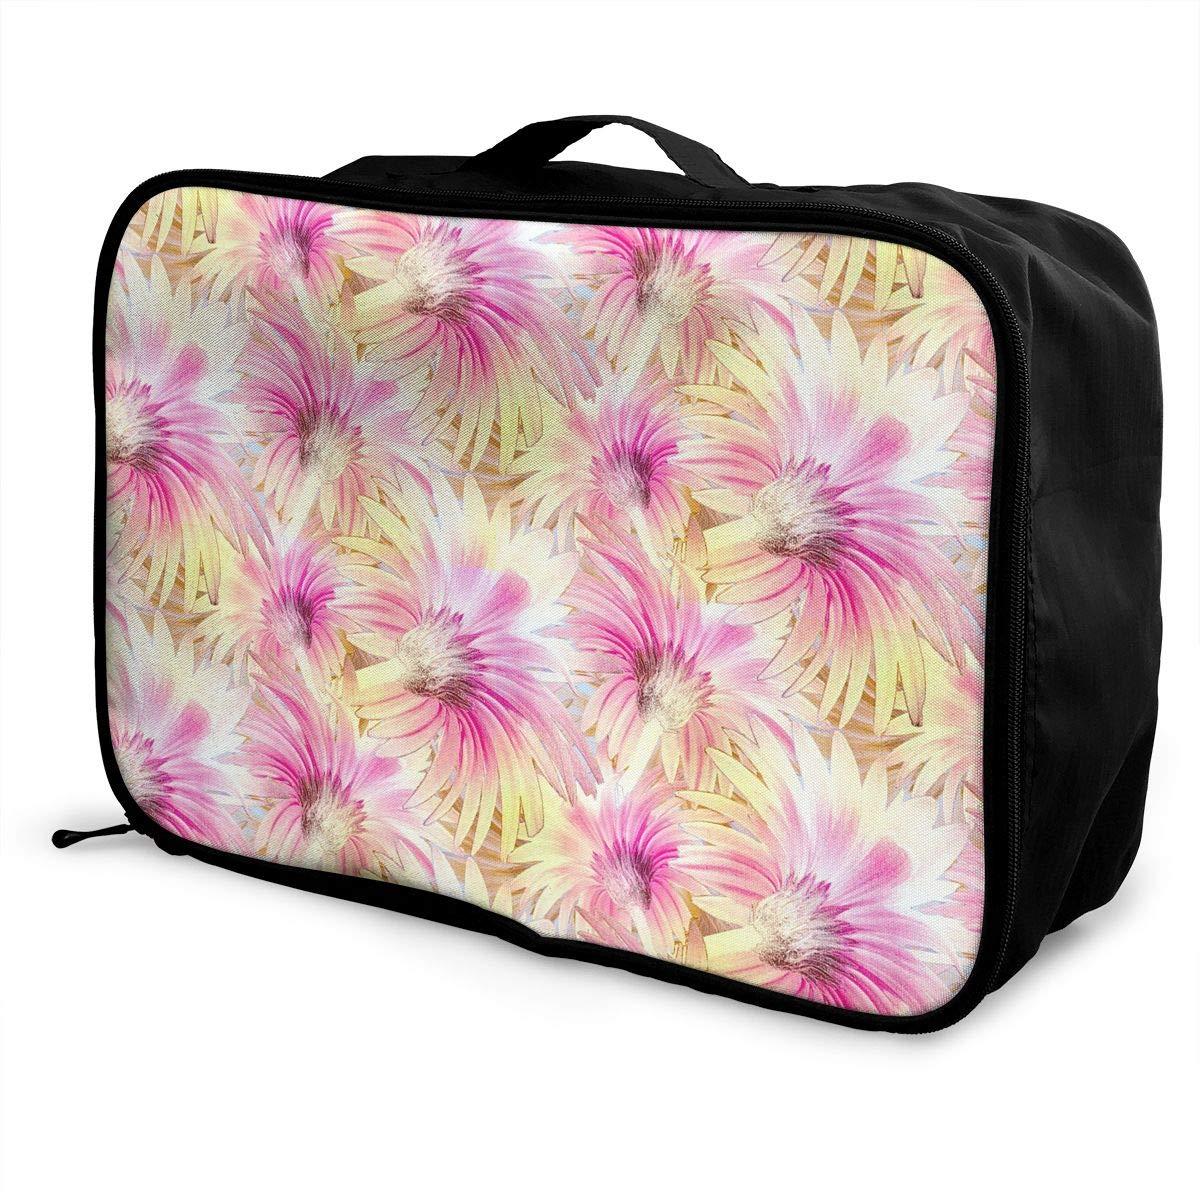 Travel Luggage Duffle Bag Lightweight Portable Handbag Floral Flowers Large Capacity Waterproof Foldable Storage Tote